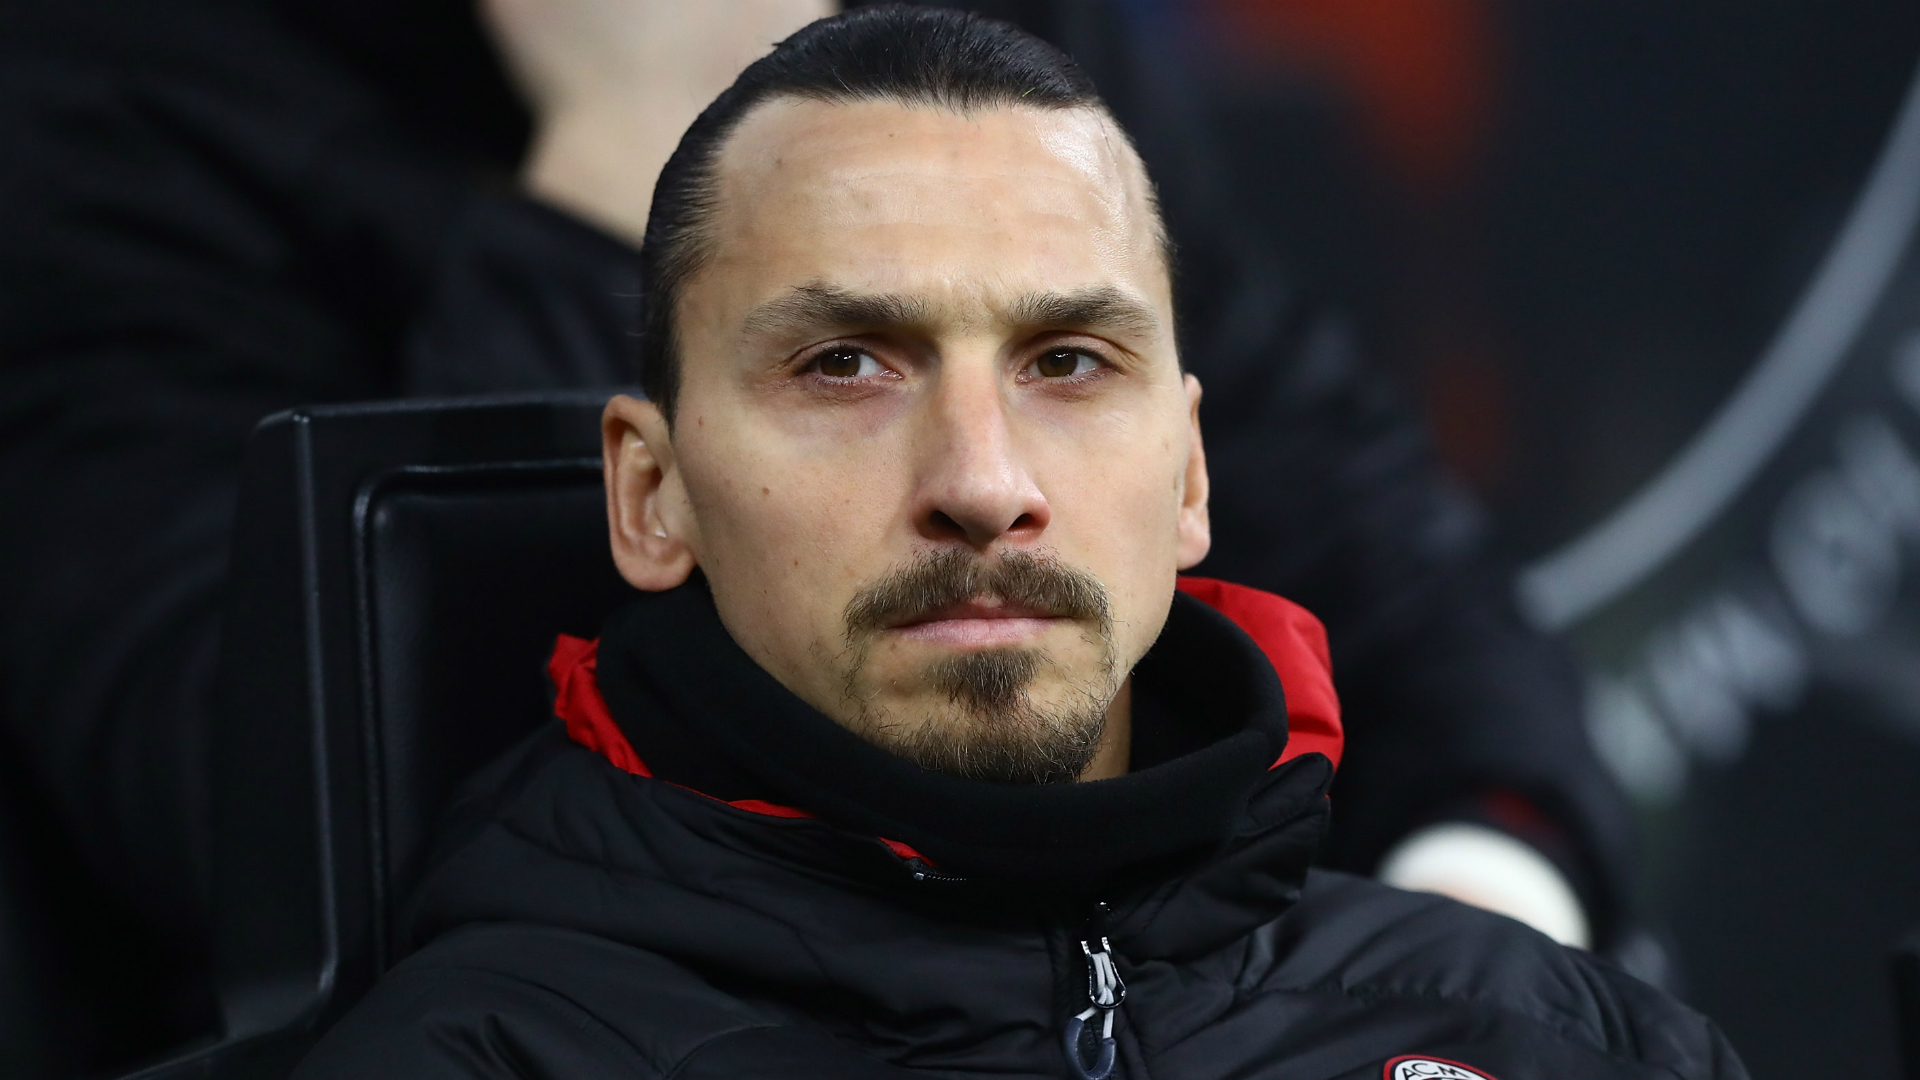 Milan boss Pioli hails 'really important' Ibrahimovic